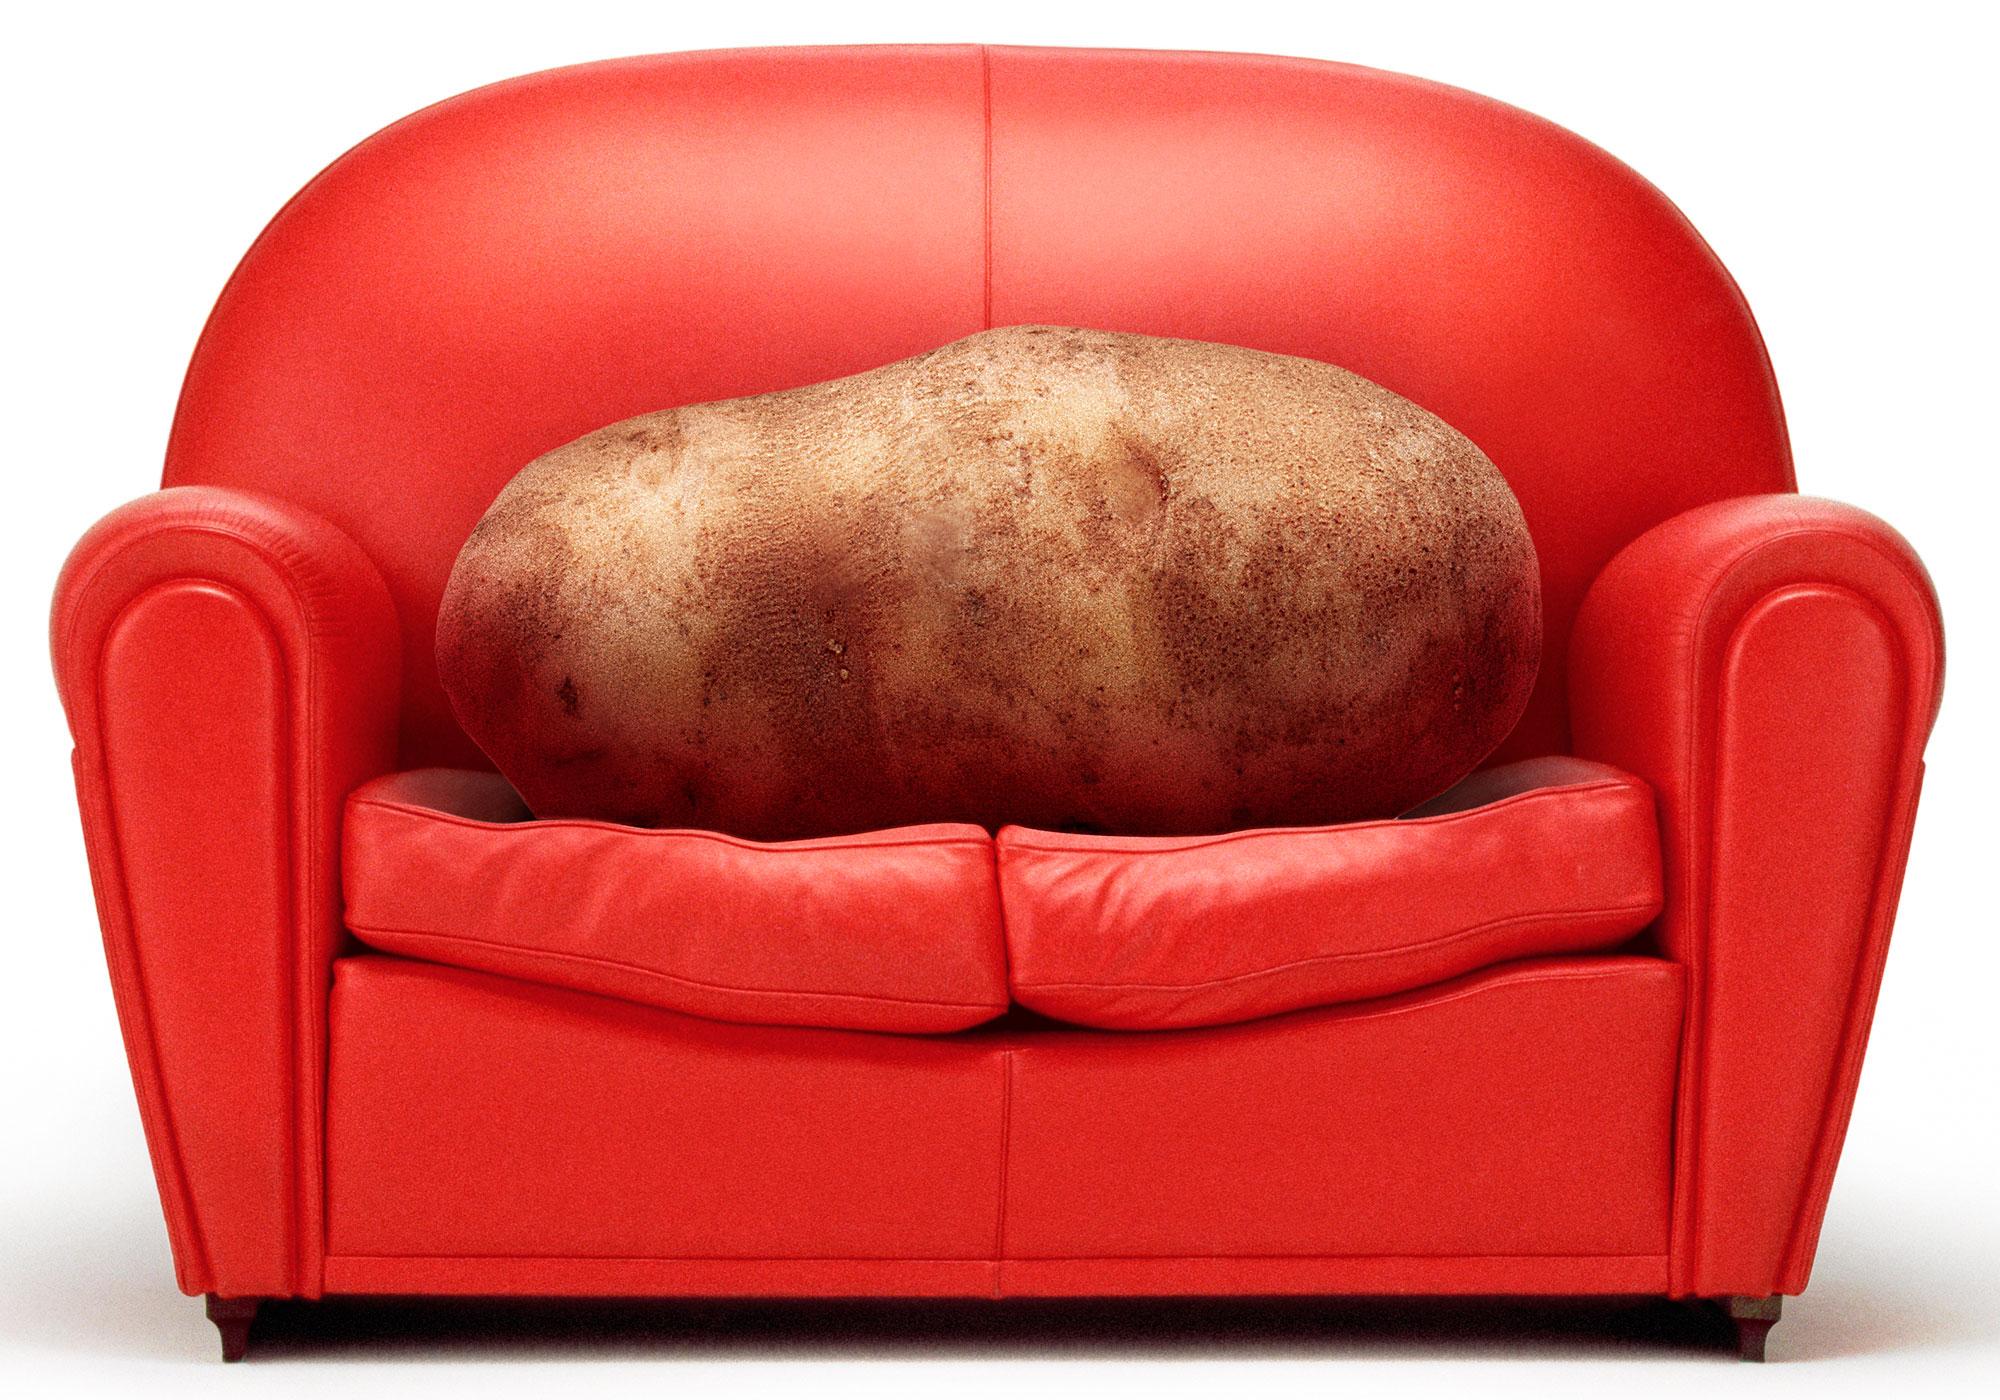 Couch-Potato.jpg